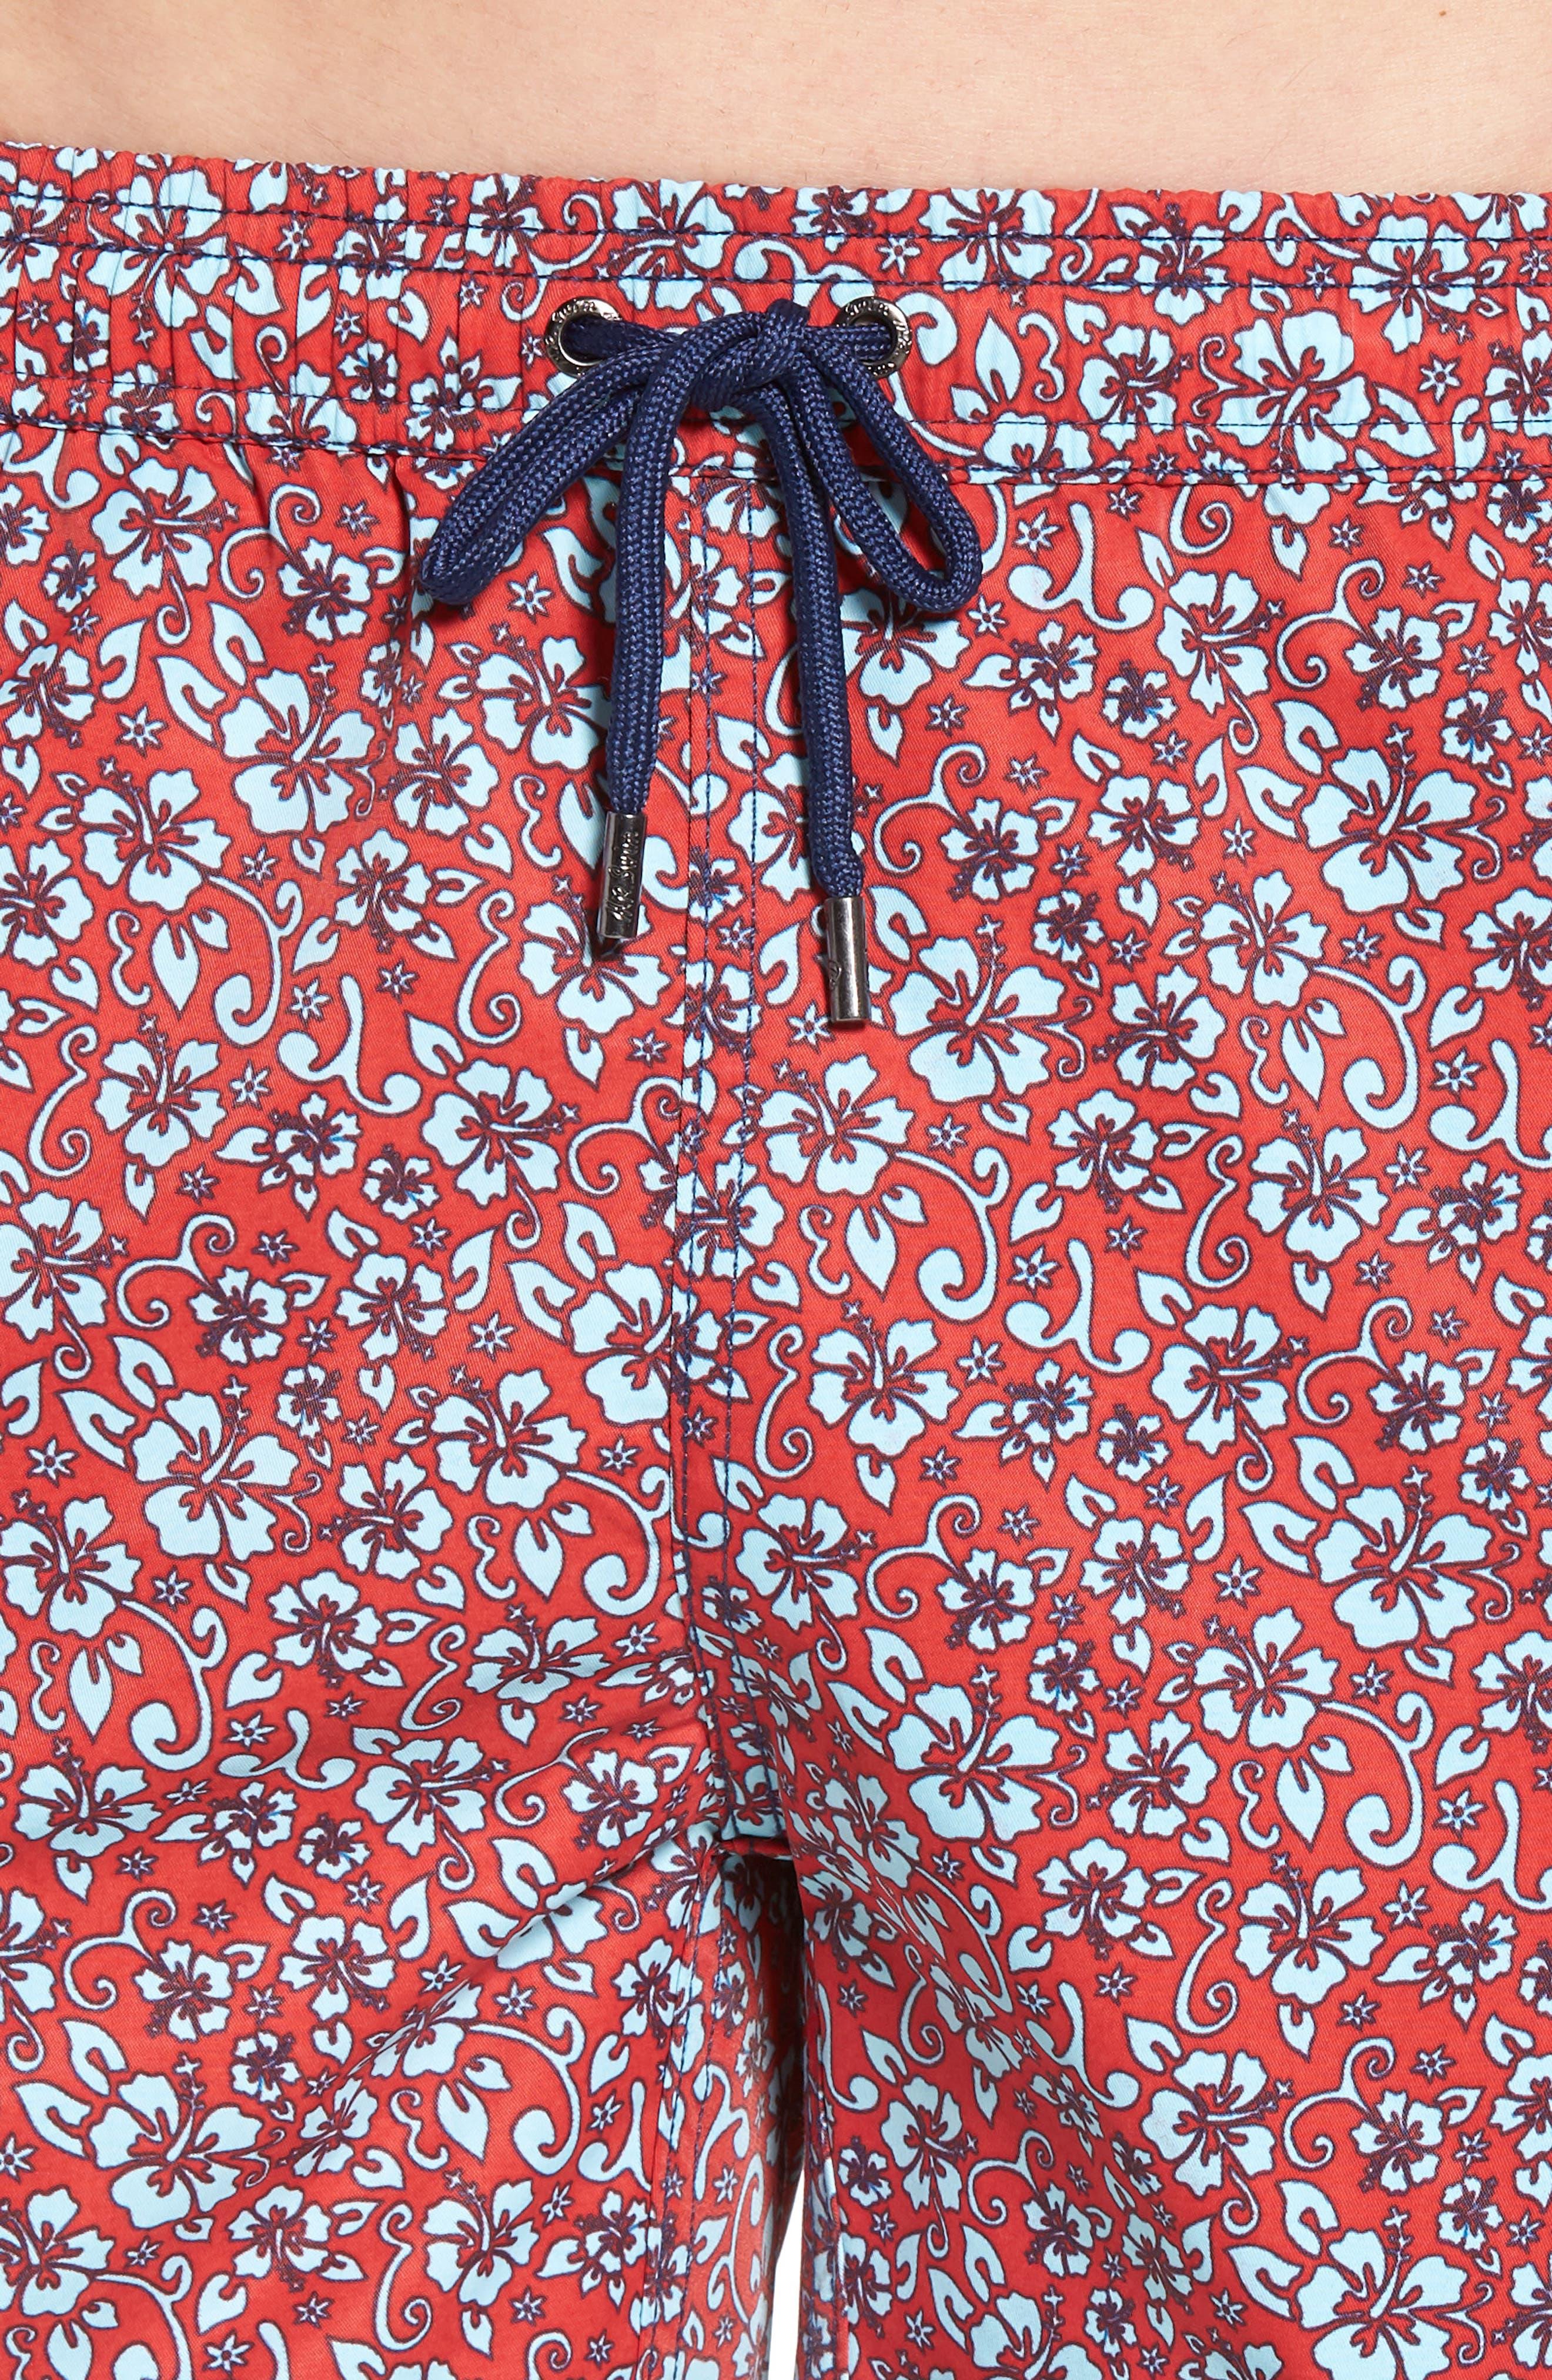 Mr. Swim Trim Fit Floral Swim Trunks,                             Alternate thumbnail 4, color,                             Red